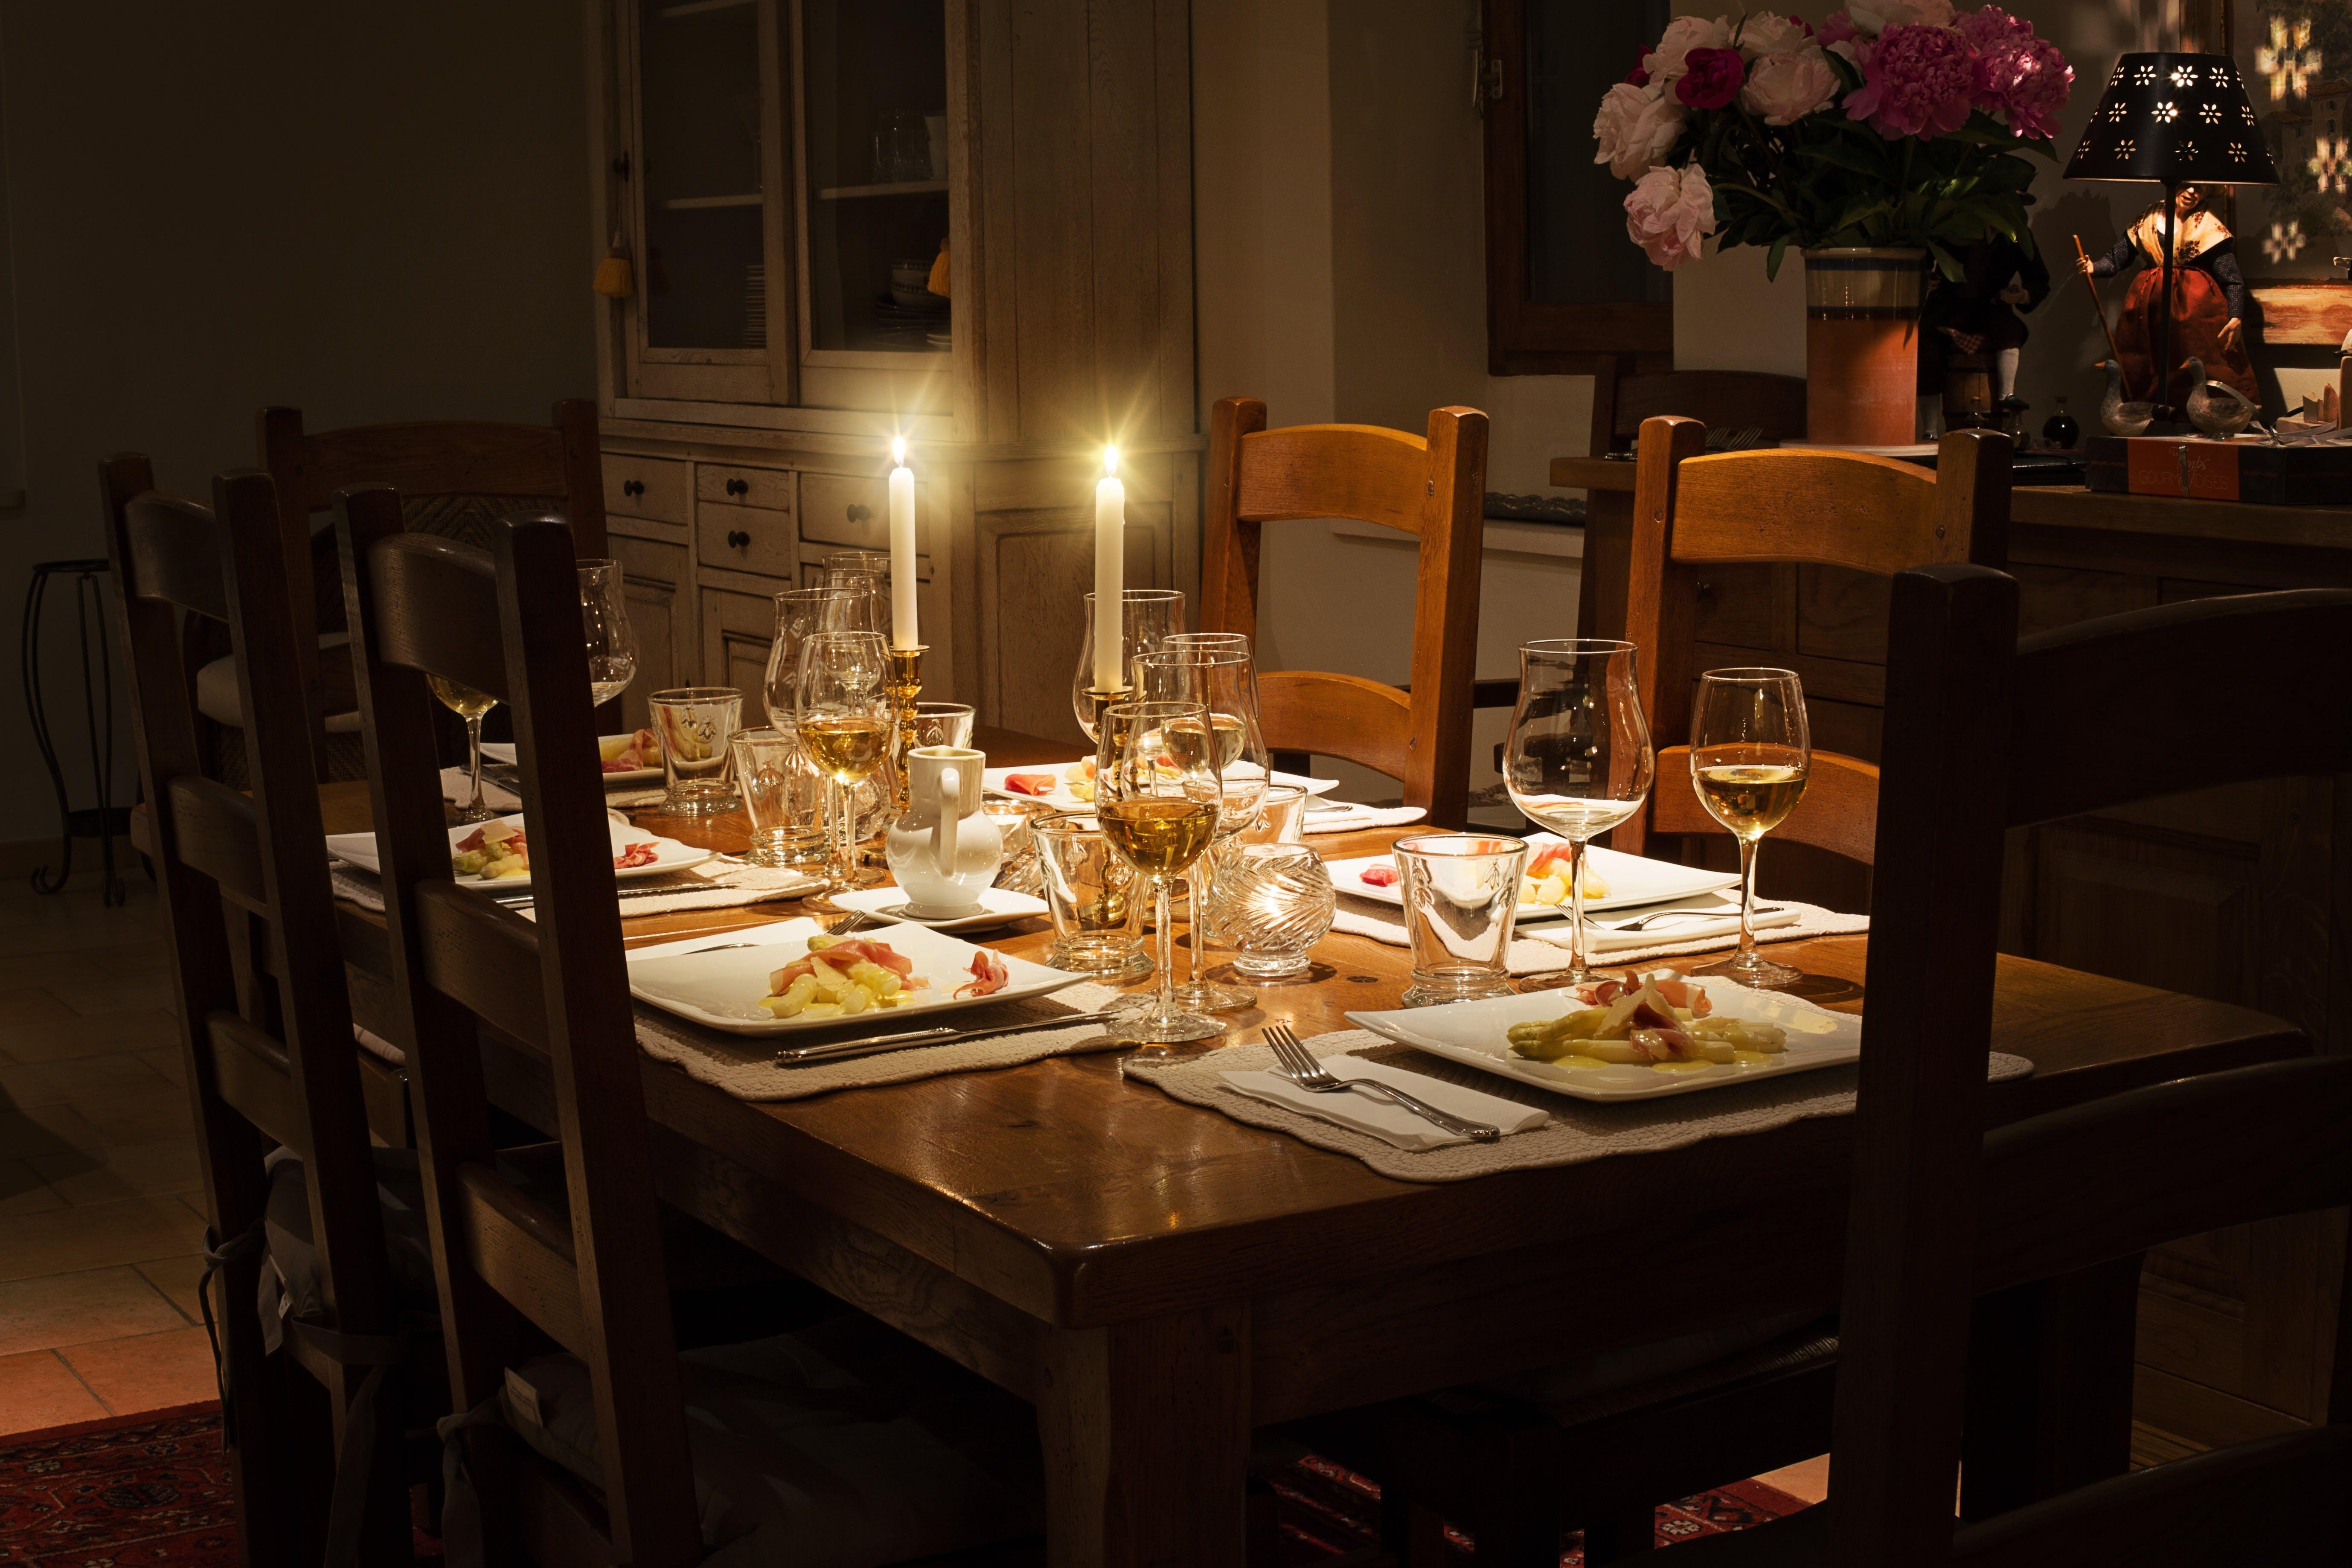 Dinnerware Set on Brown Wooden Table